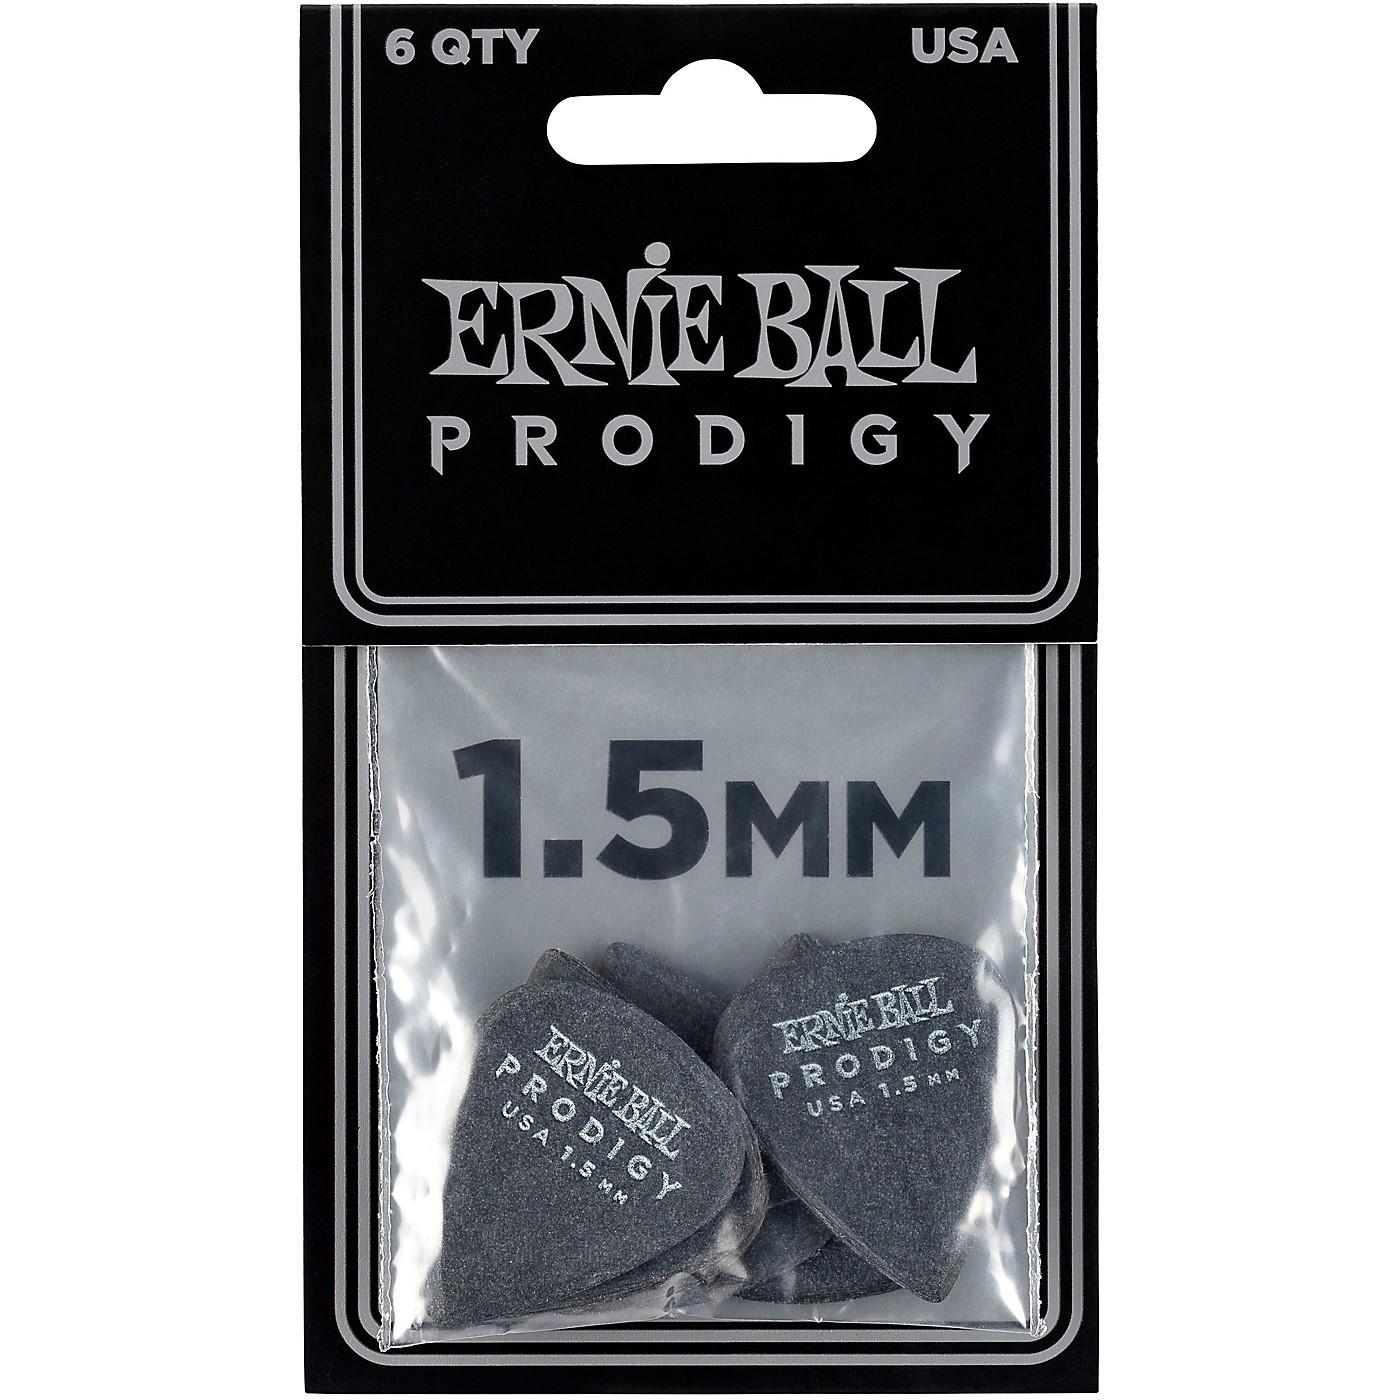 Ernie Ball Prodigy Picks Standard thumbnail